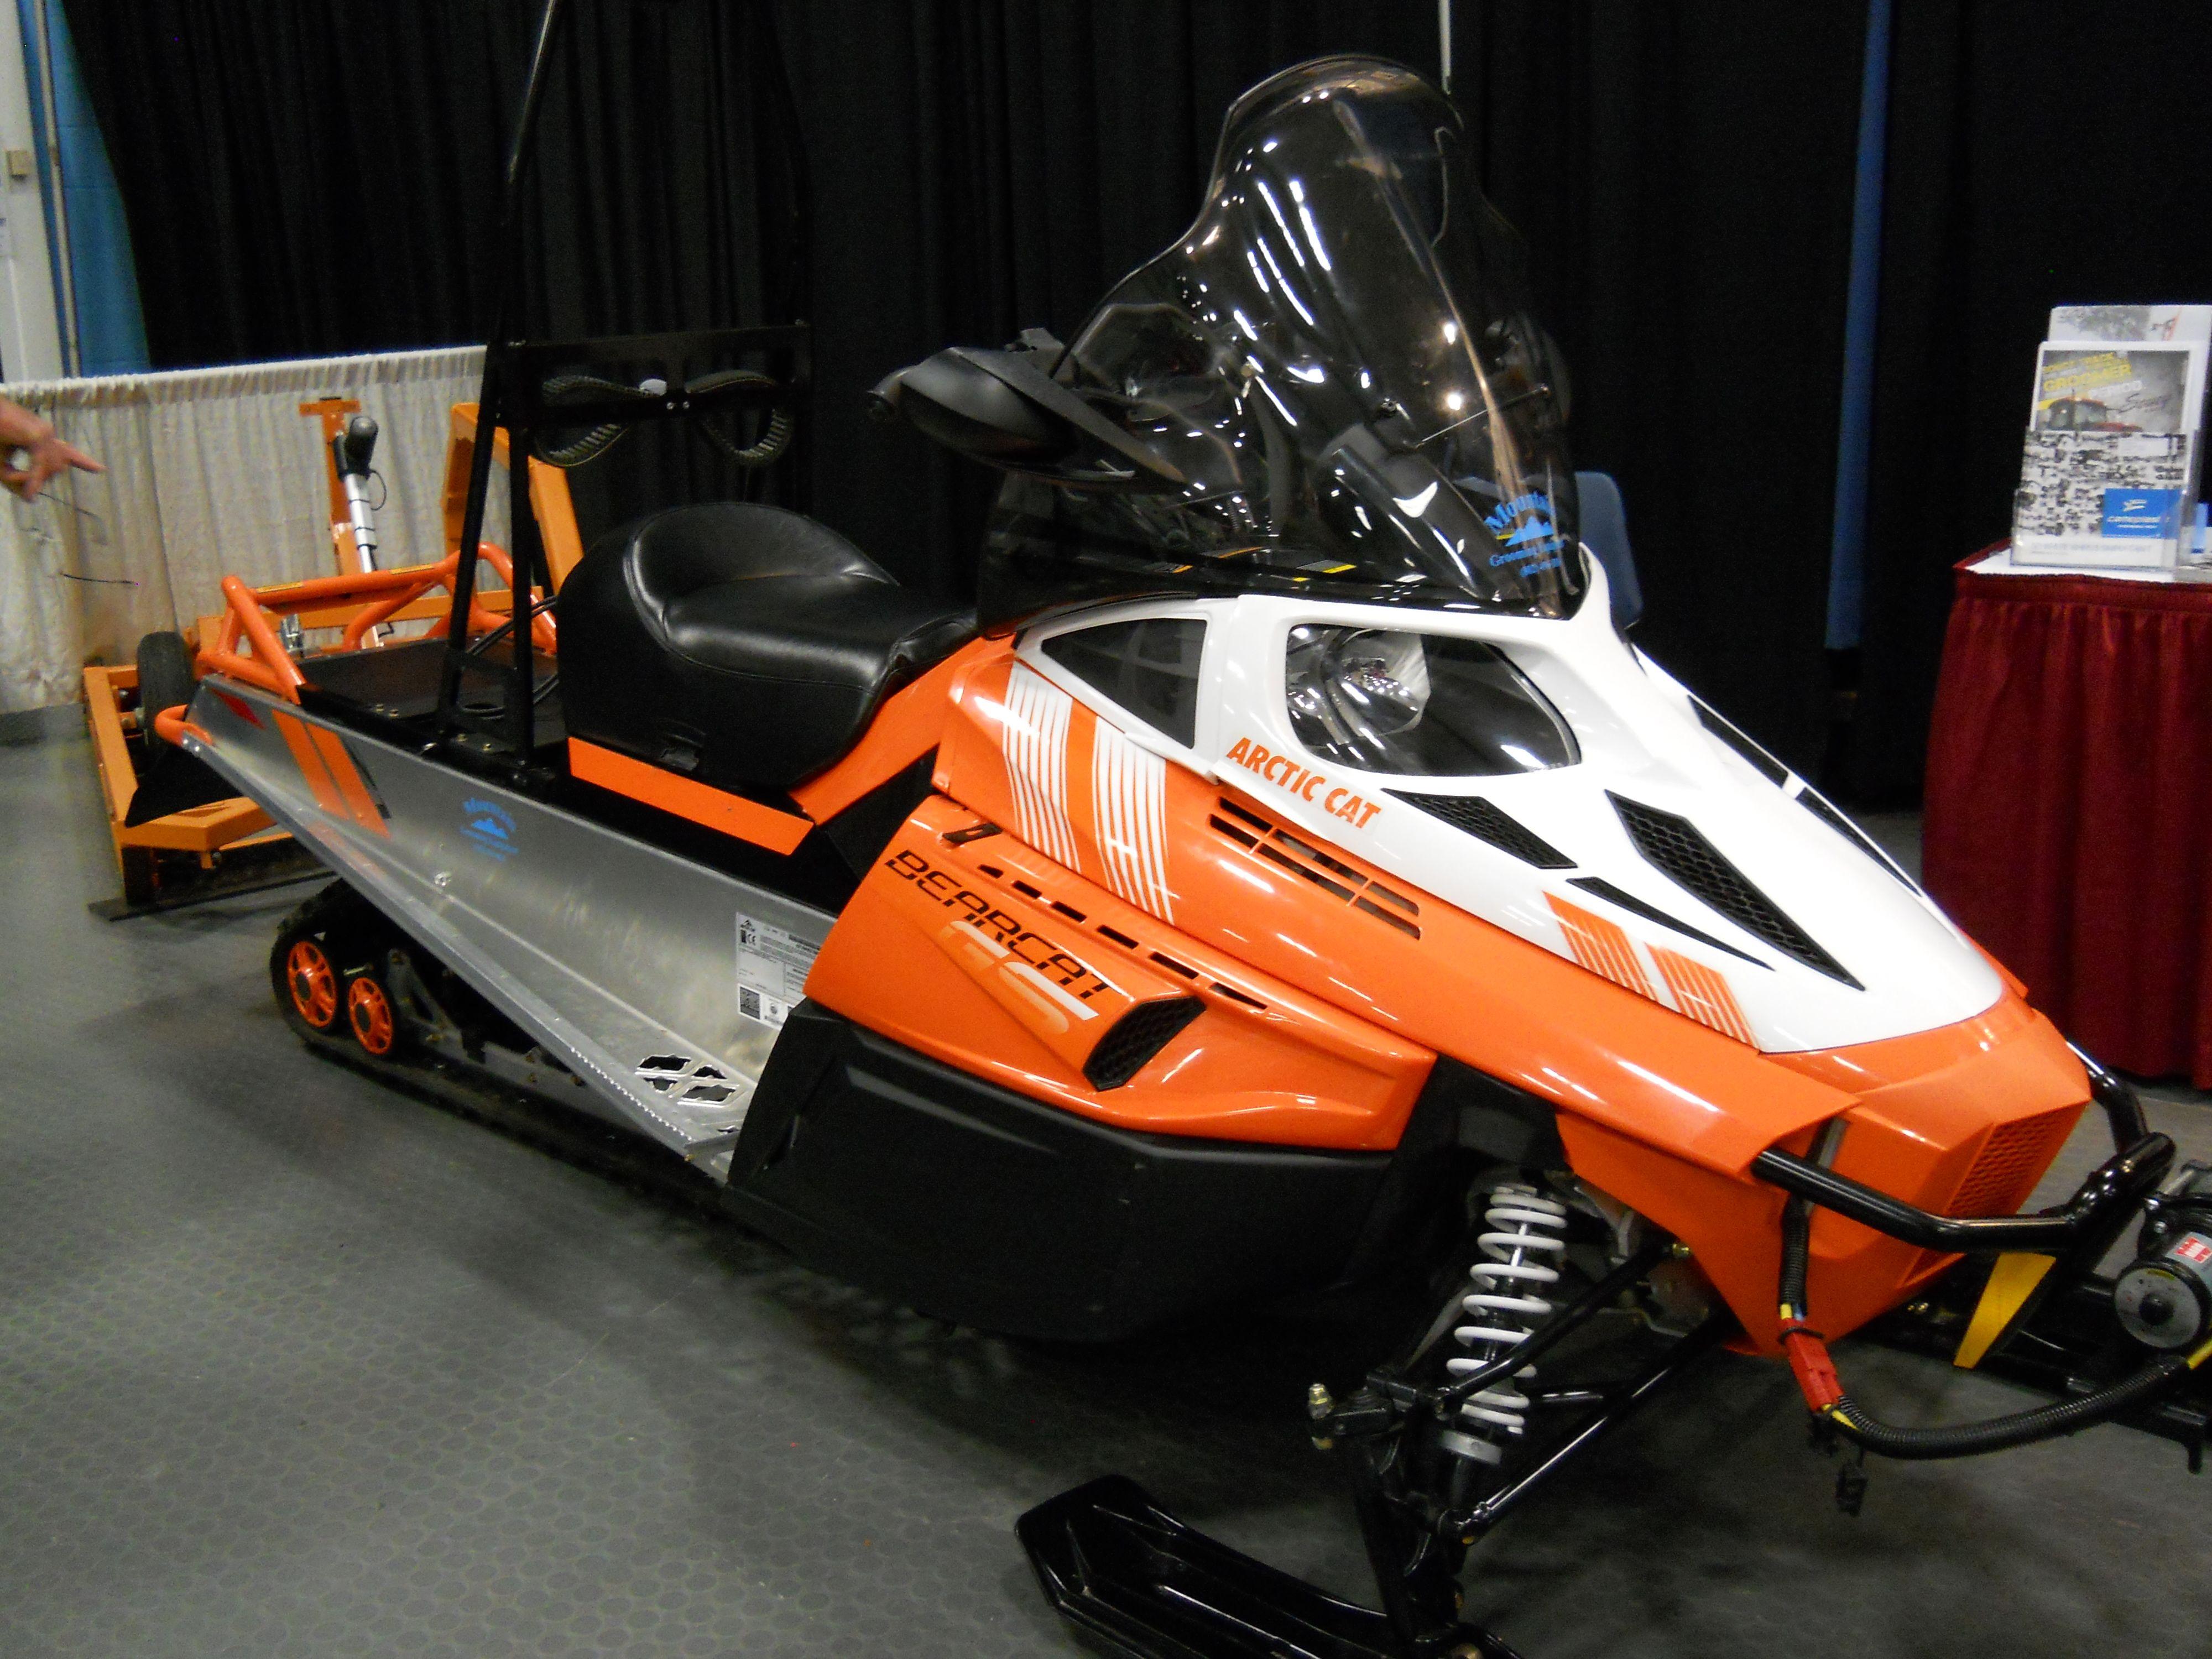 Mountain Grooming Equipment BearCat ArticCat Snowmobile